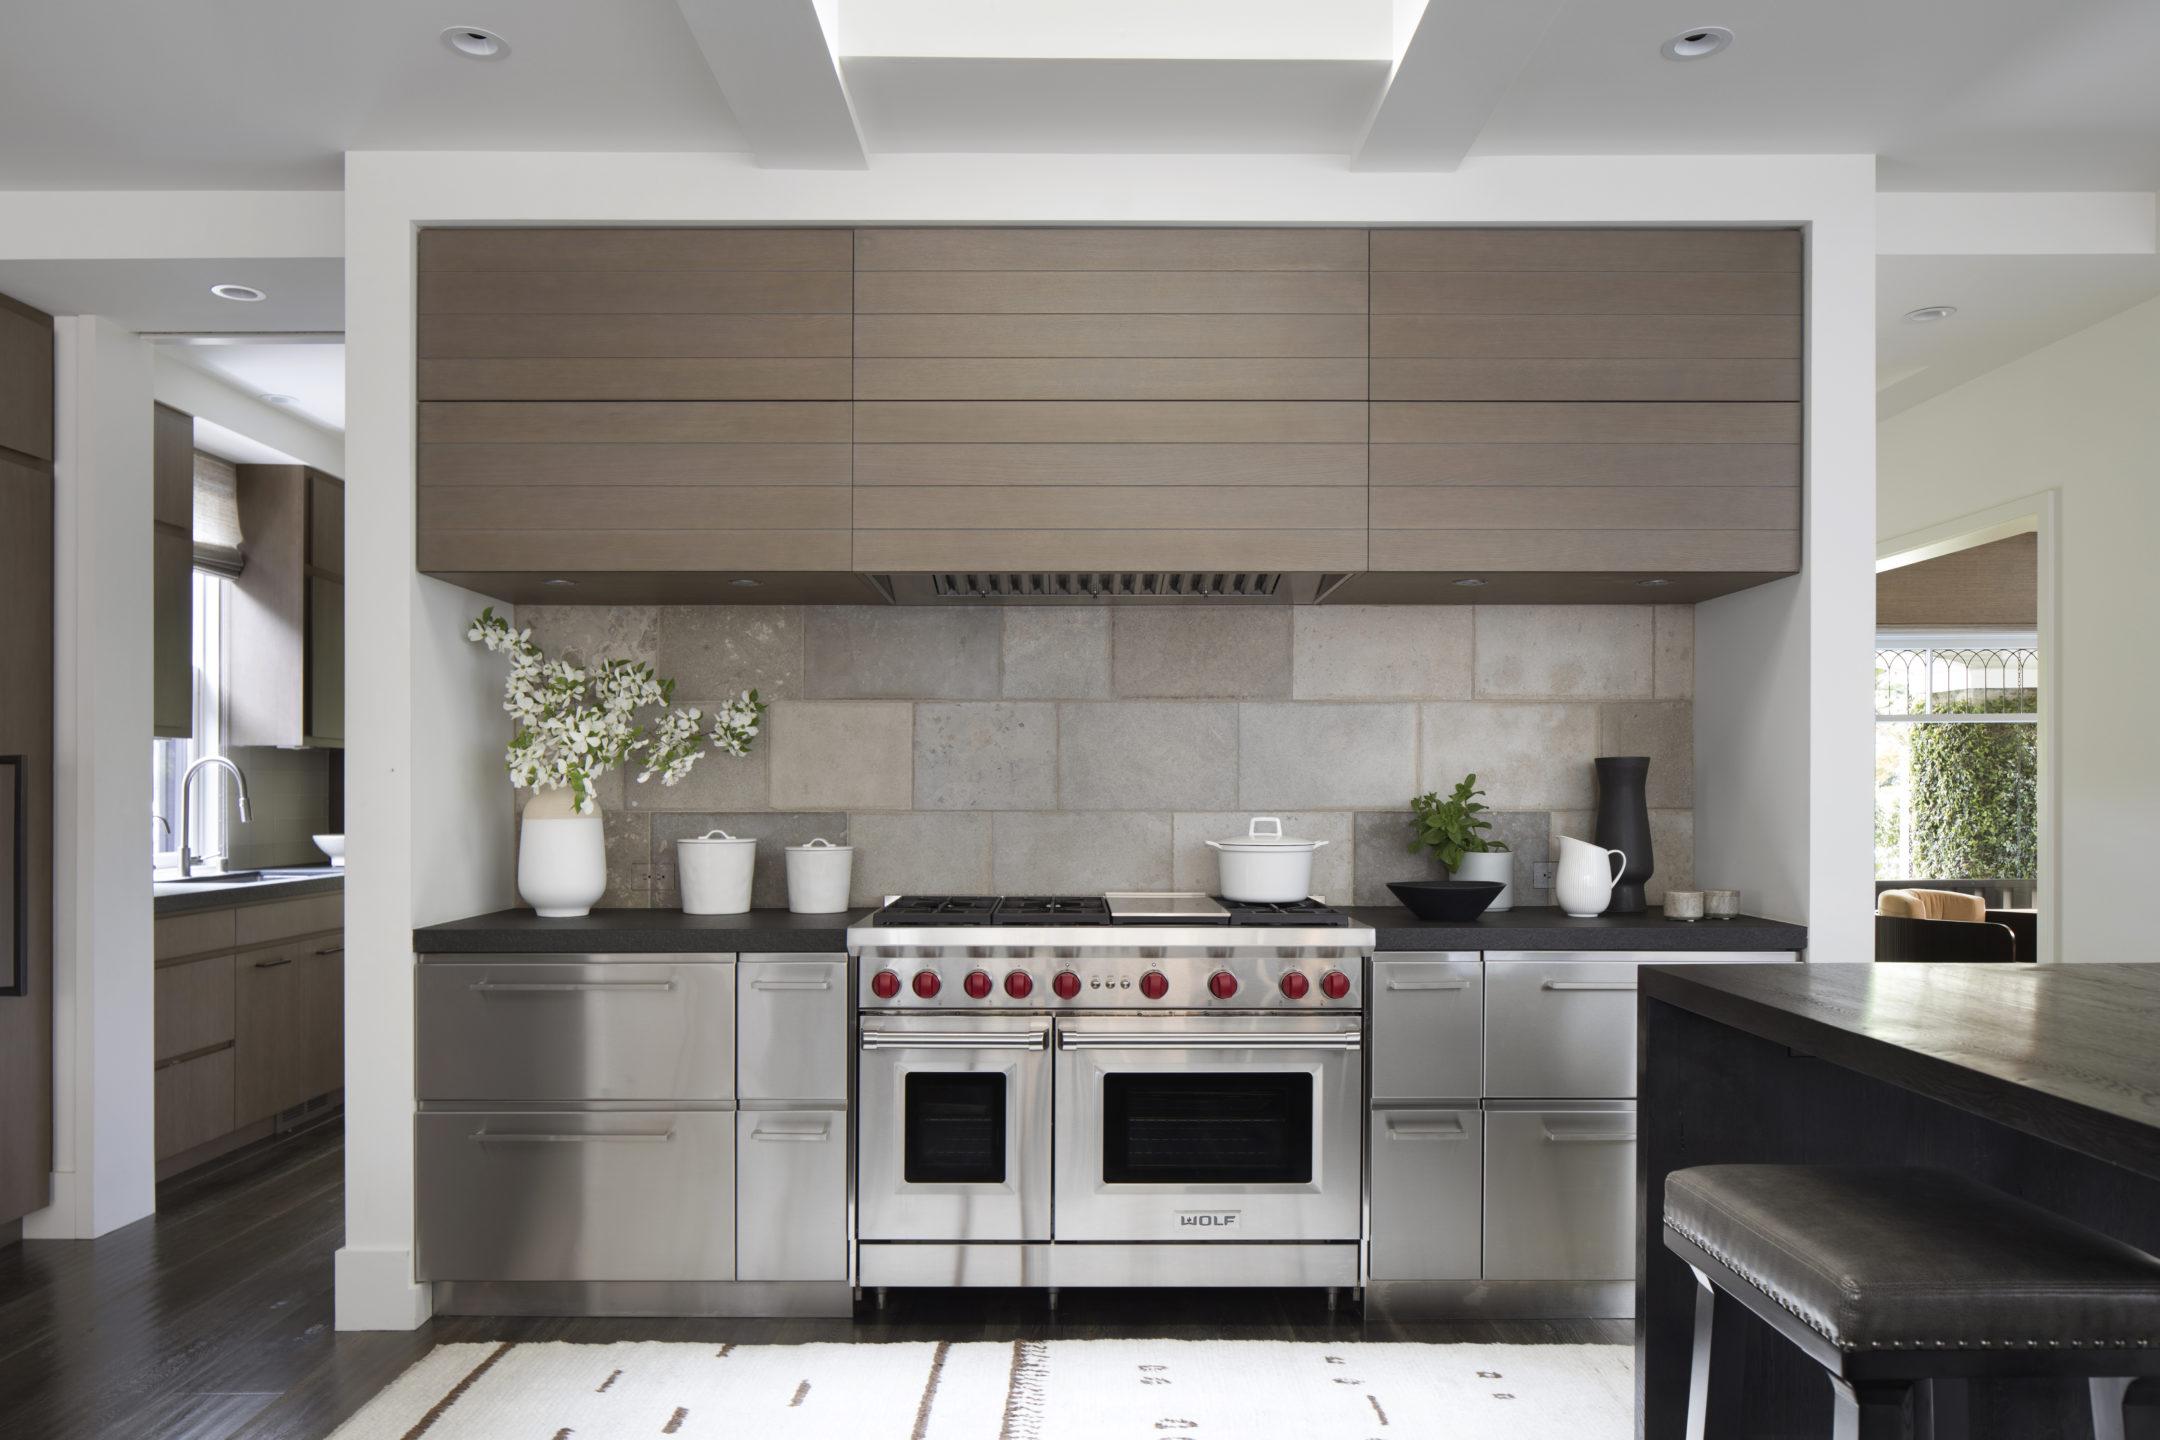 Jennifer_robins_interiors_projects_downtown_sonoma_4_kitchen